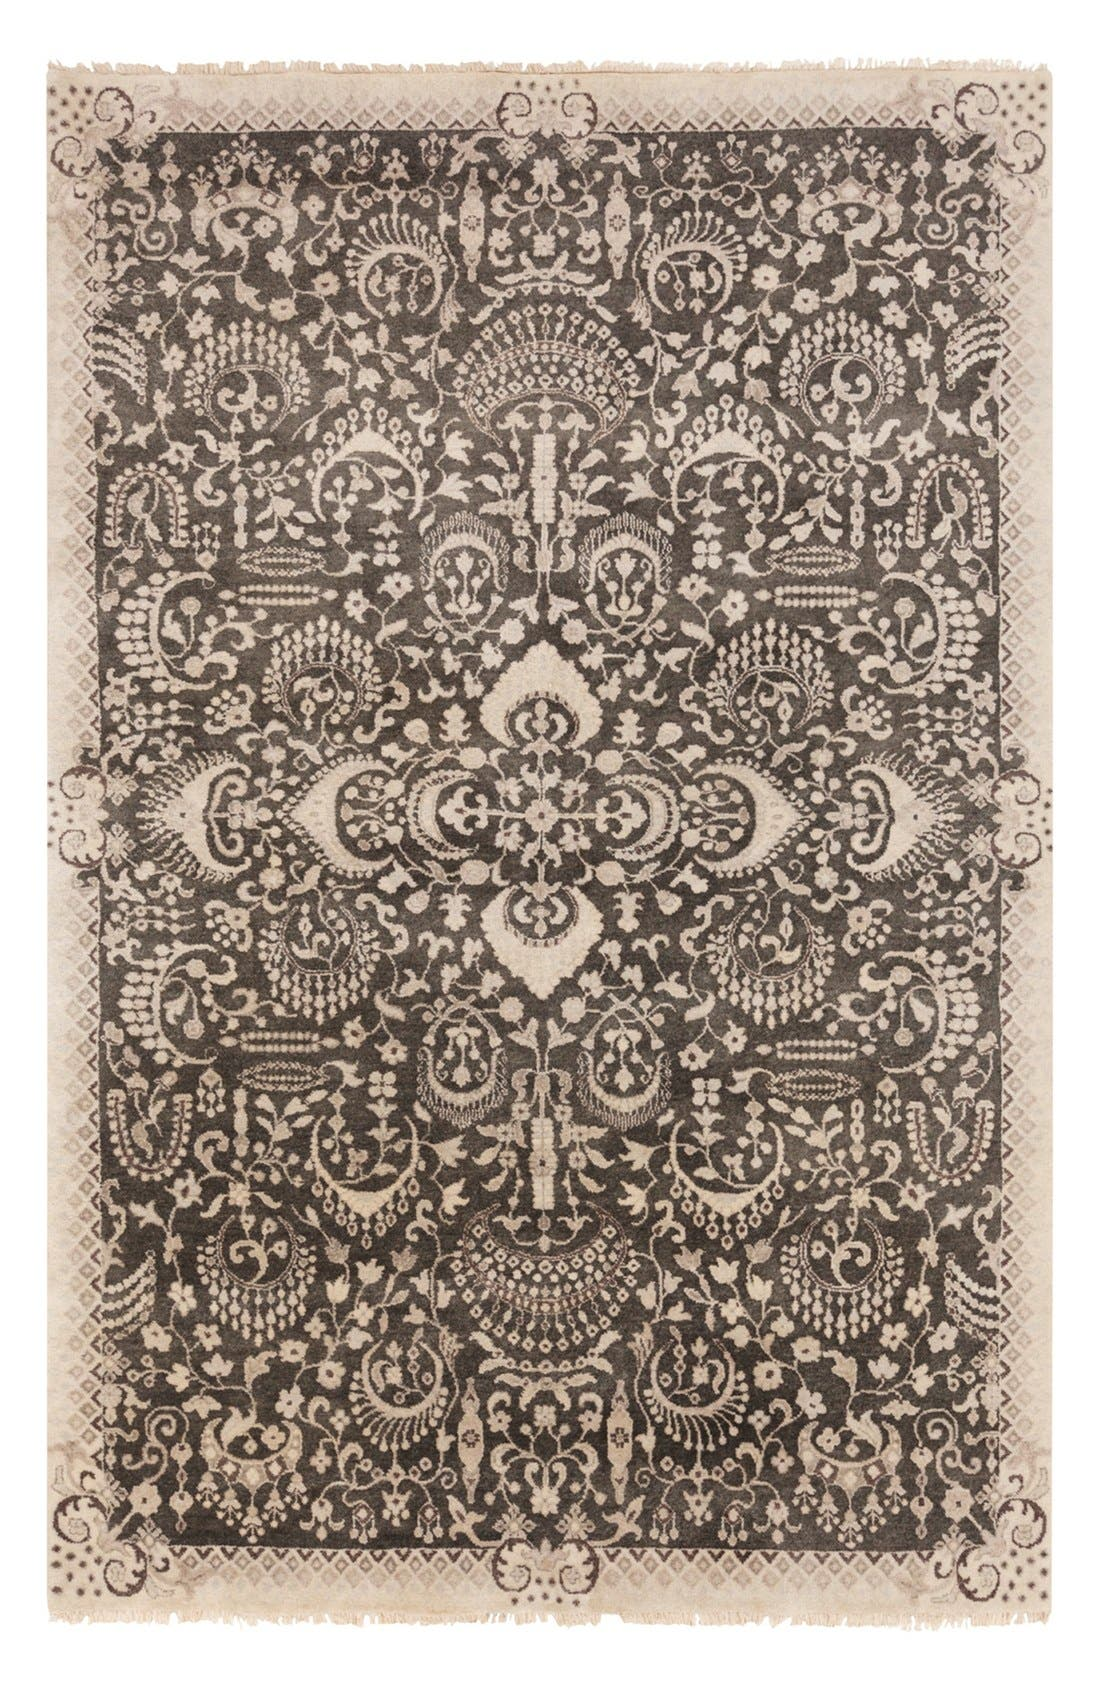 Alternate Image 1 Selected - Surya Home 'Empress' Wool Rug